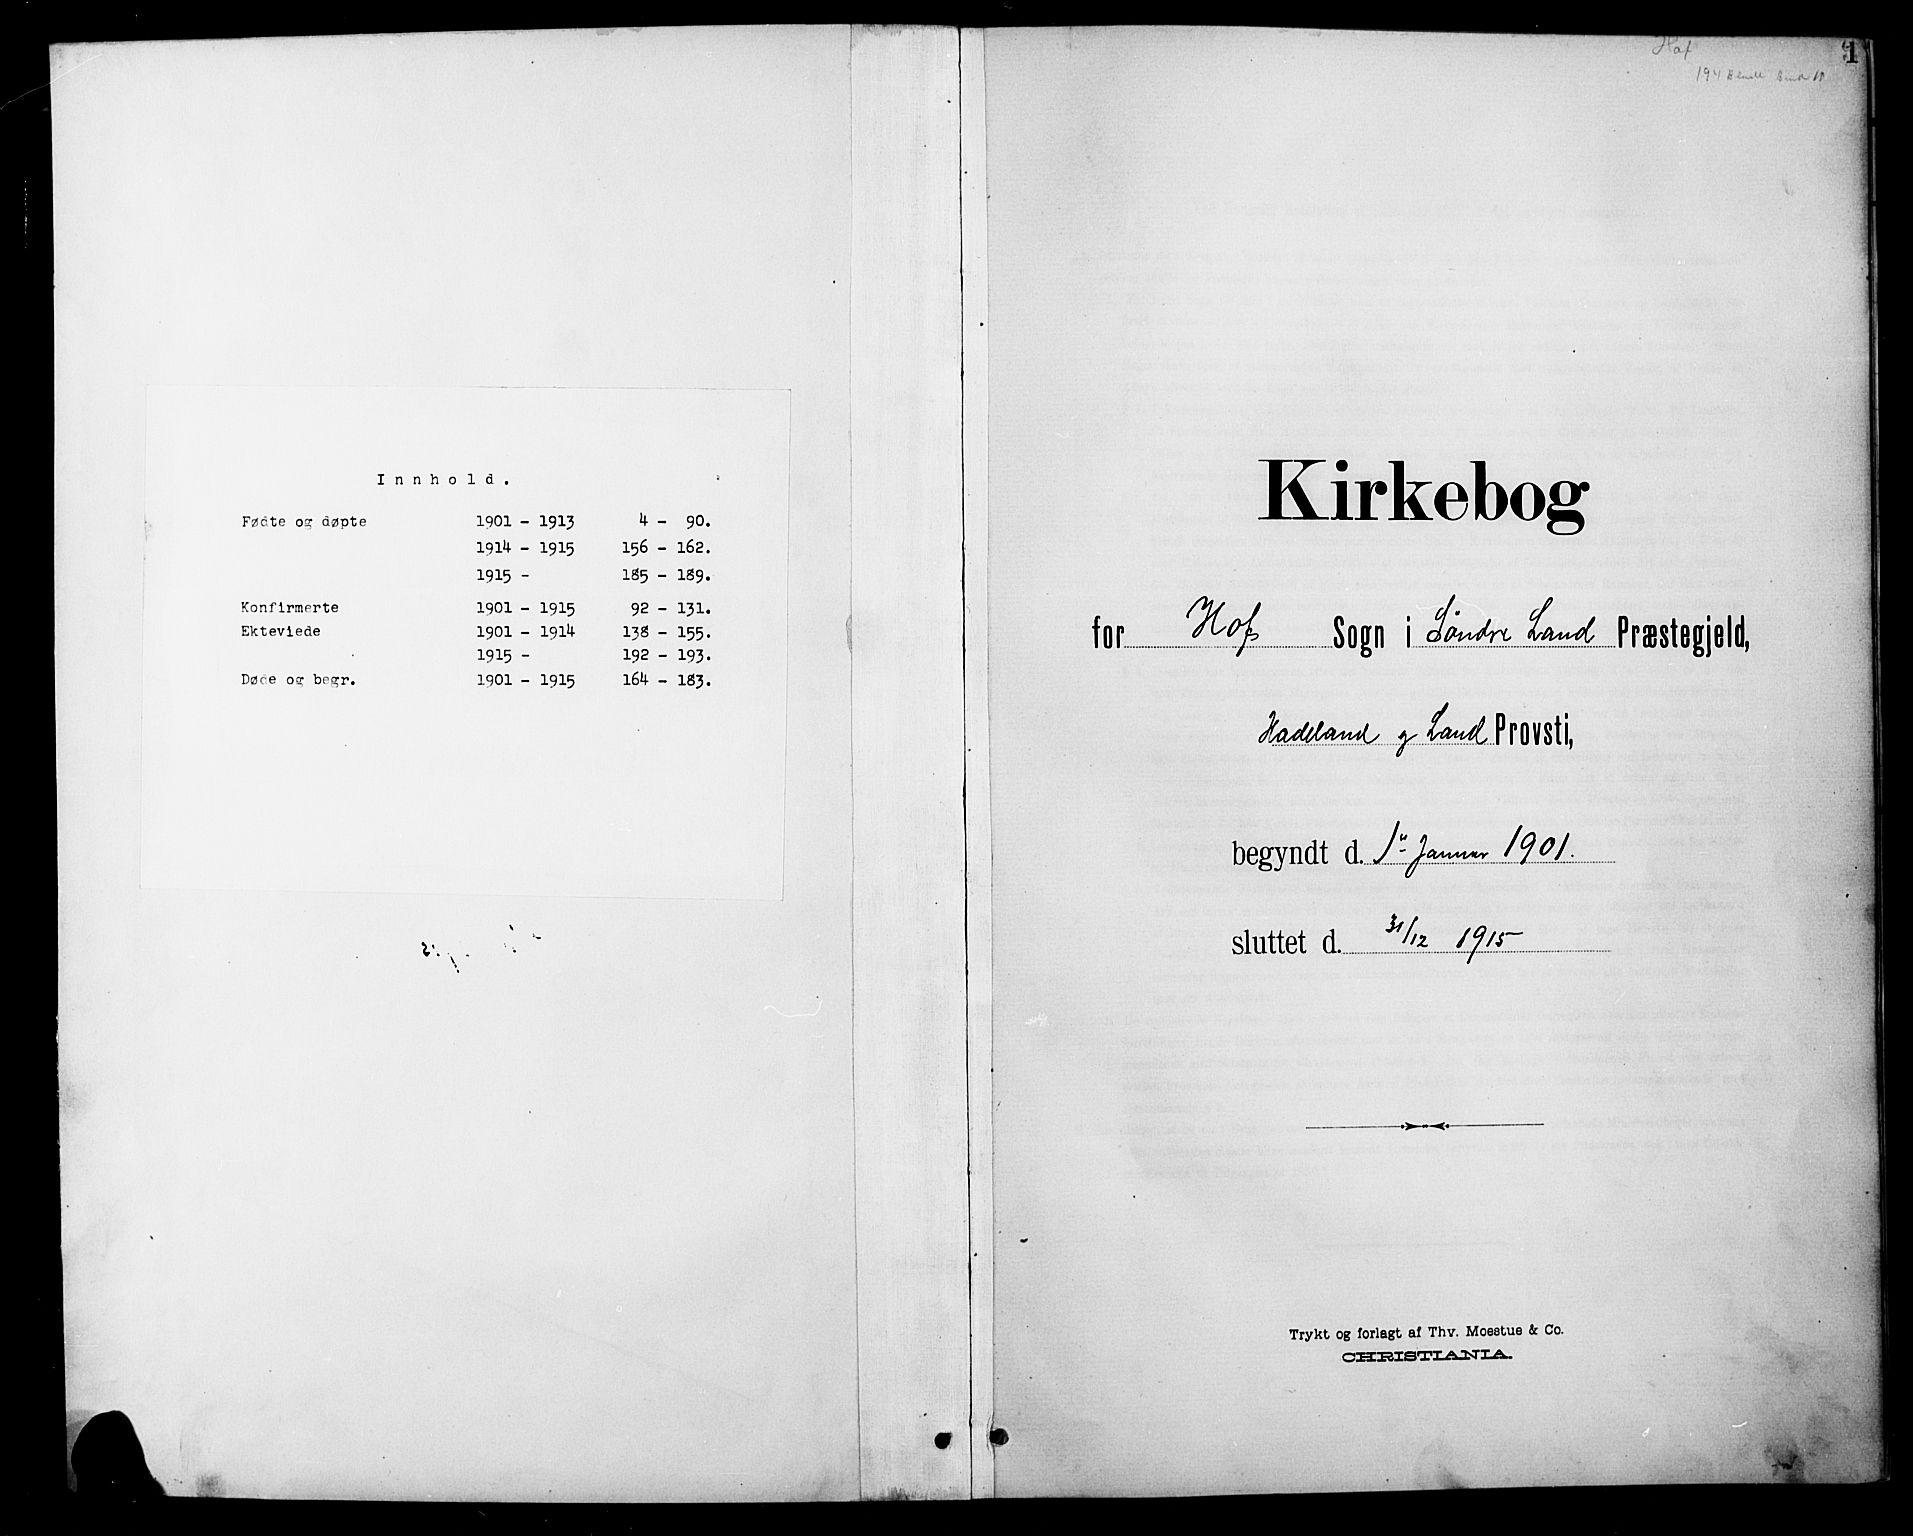 SAH, Søndre Land prestekontor, L/L0004: Klokkerbok nr. 4, 1901-1915, s. 1